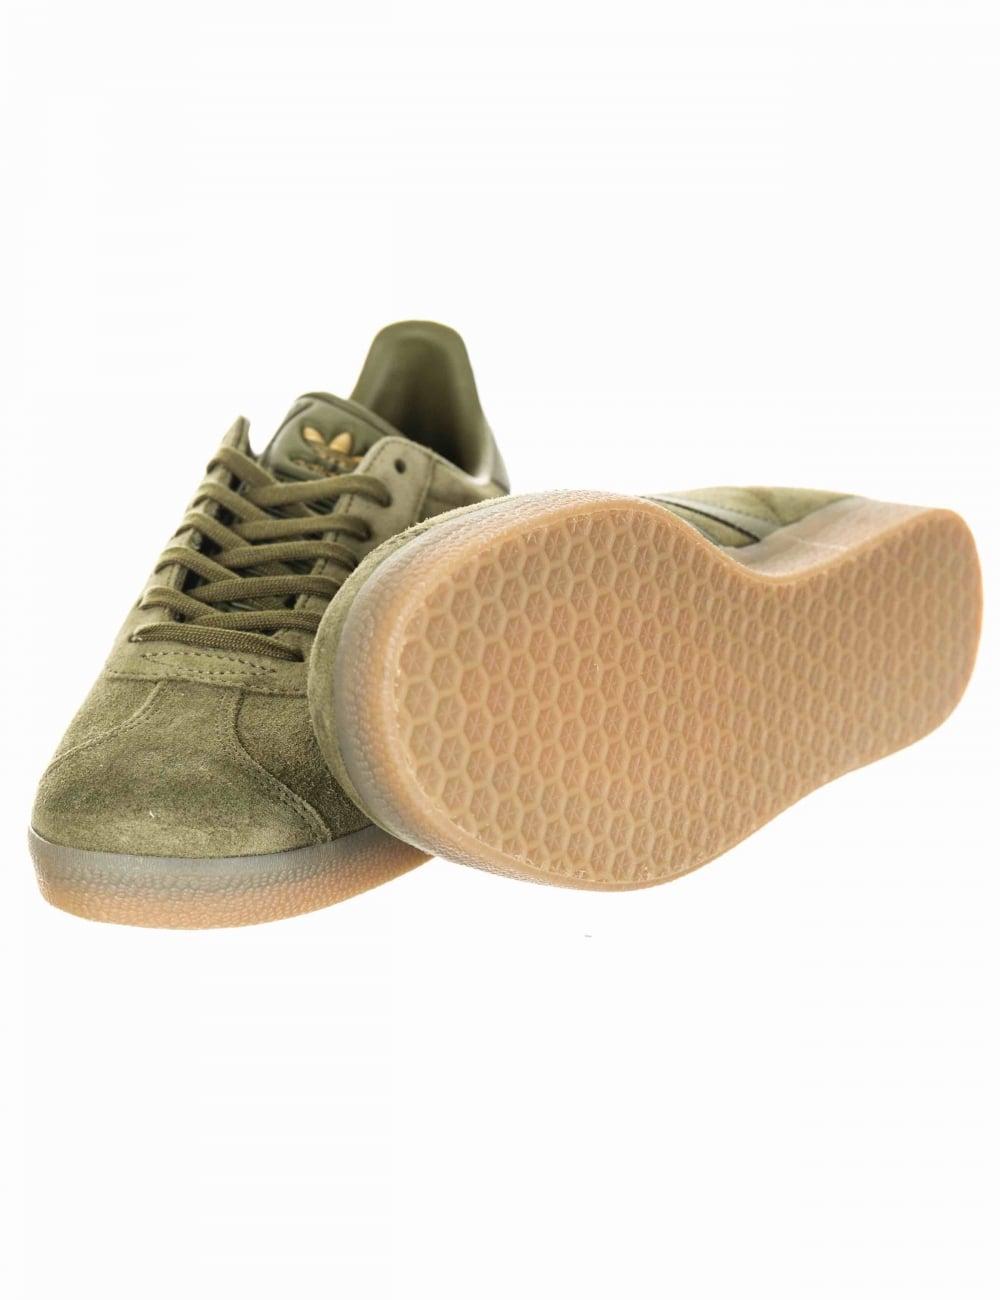 reputable site e2698 18114 Gazelle OG Shoes - Olive CargoGum